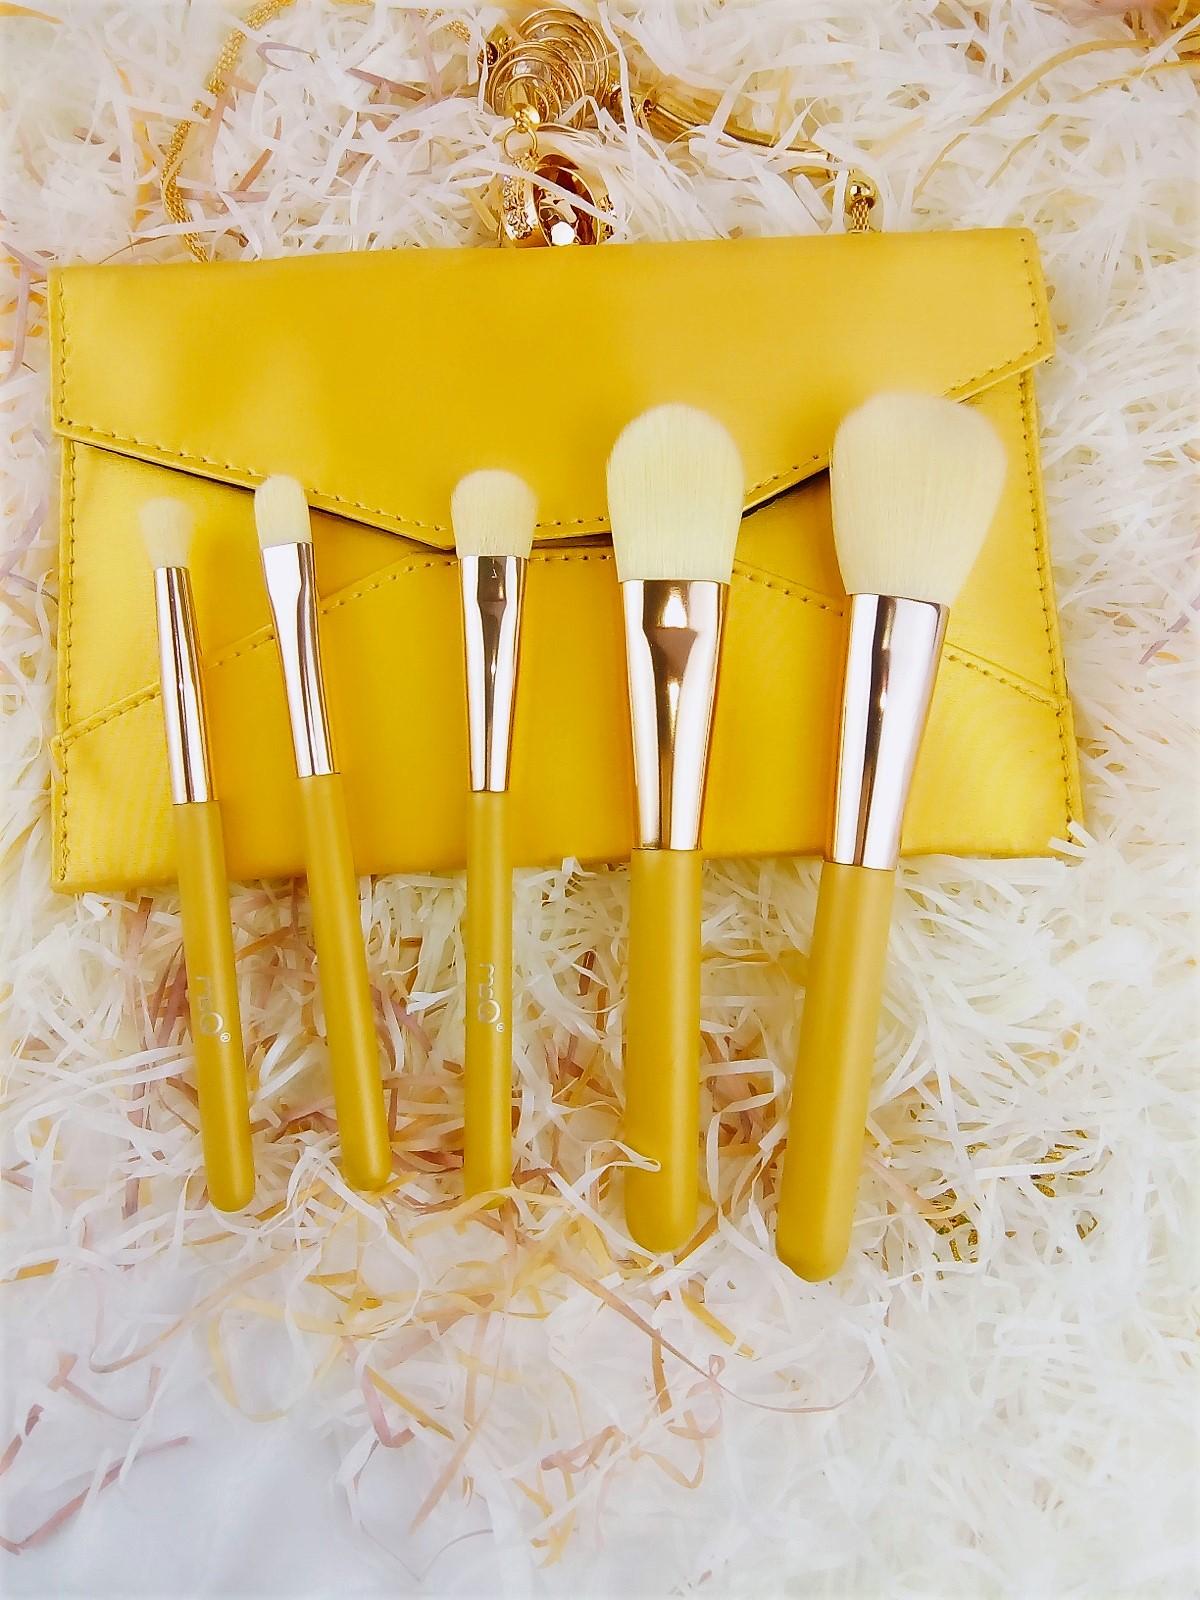 Набор кистей для макияжа 5 штук MSQ ( ворс таклон).